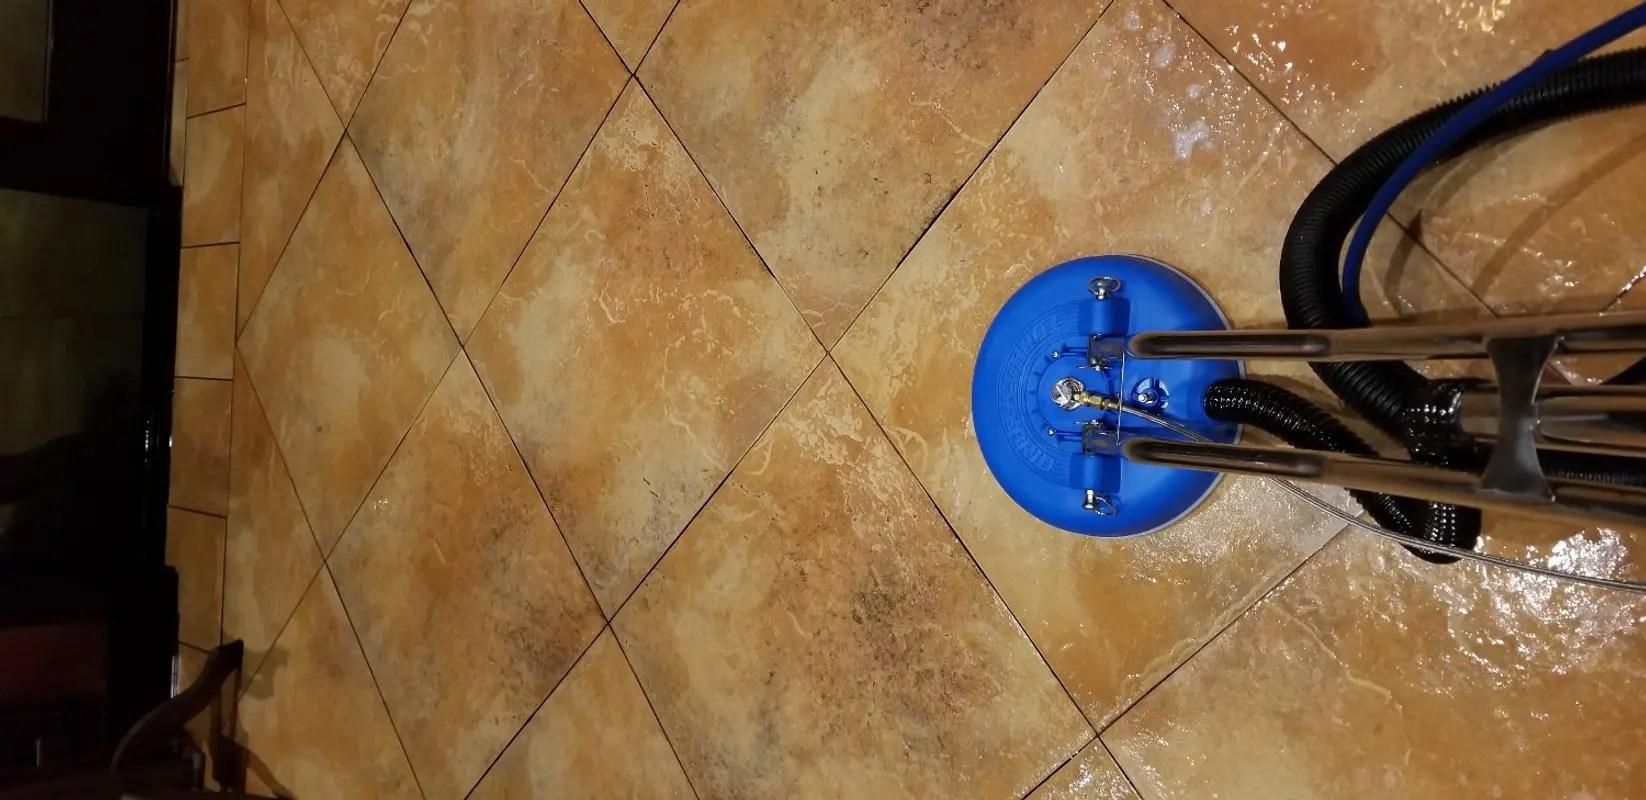 turbo force hybrid tile grout